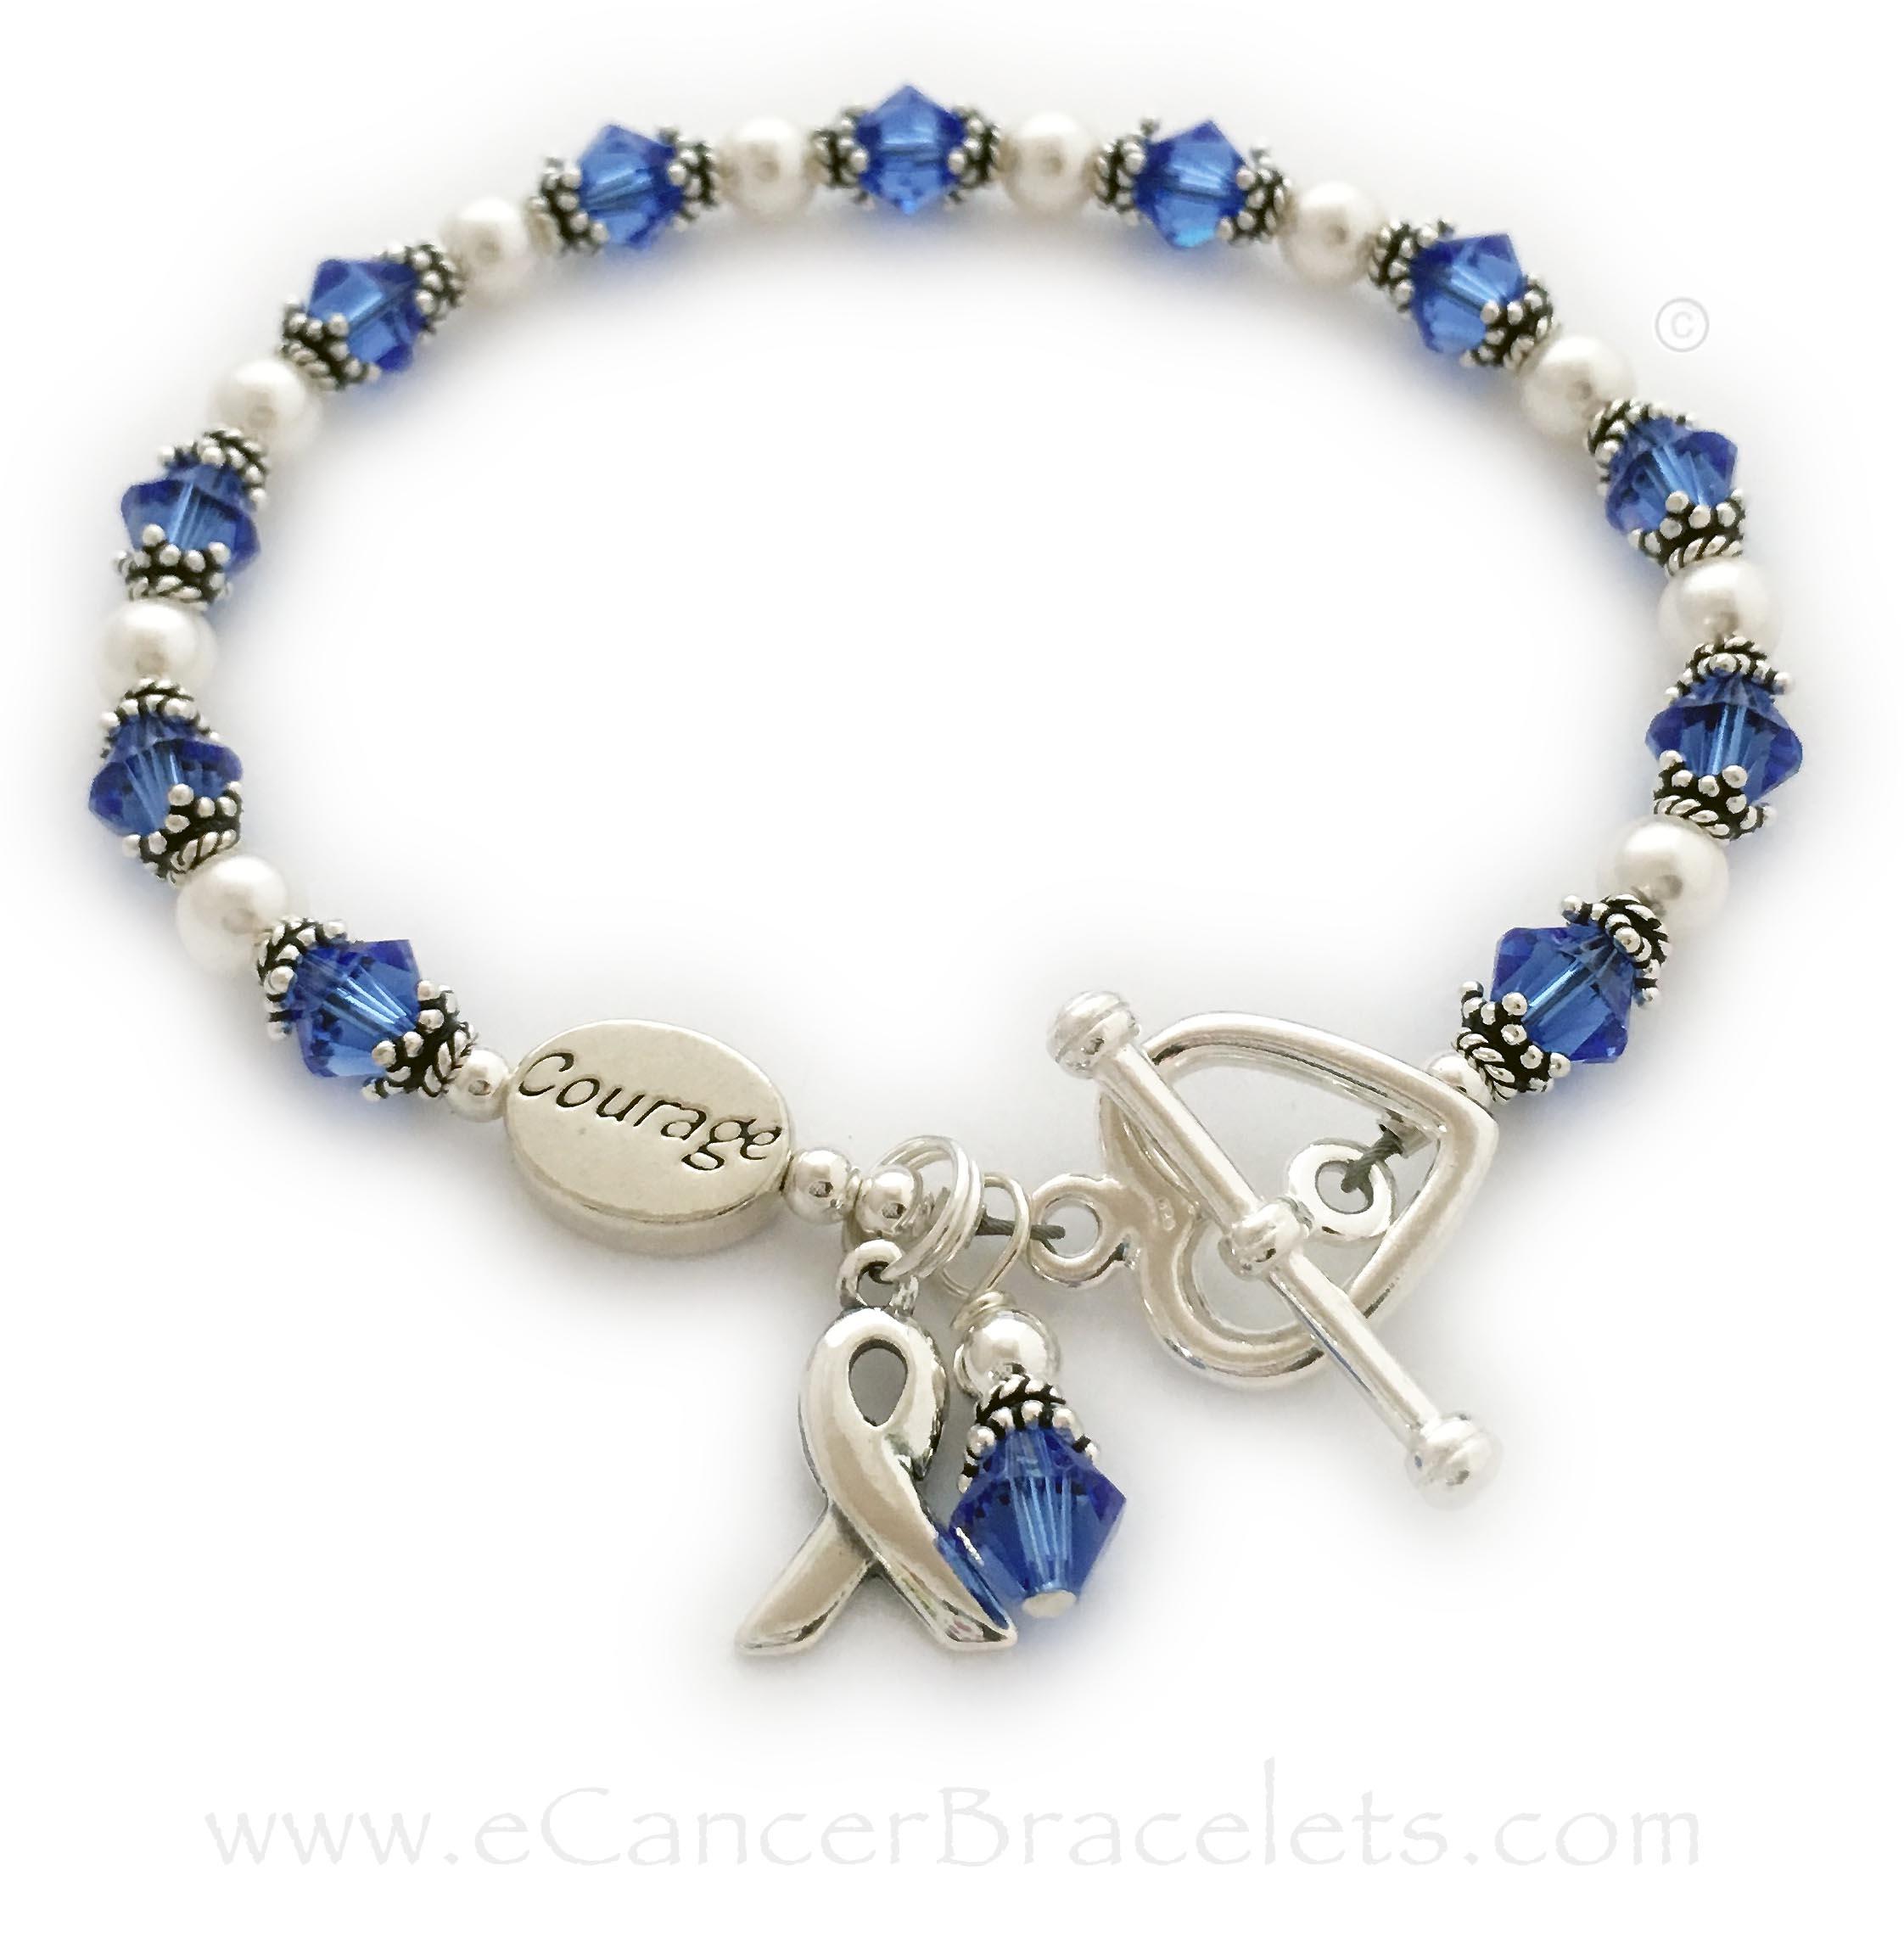 Dark Blue Ribbon Awareness Bracelets Necklaces Earrings Blue Ribbon Charm